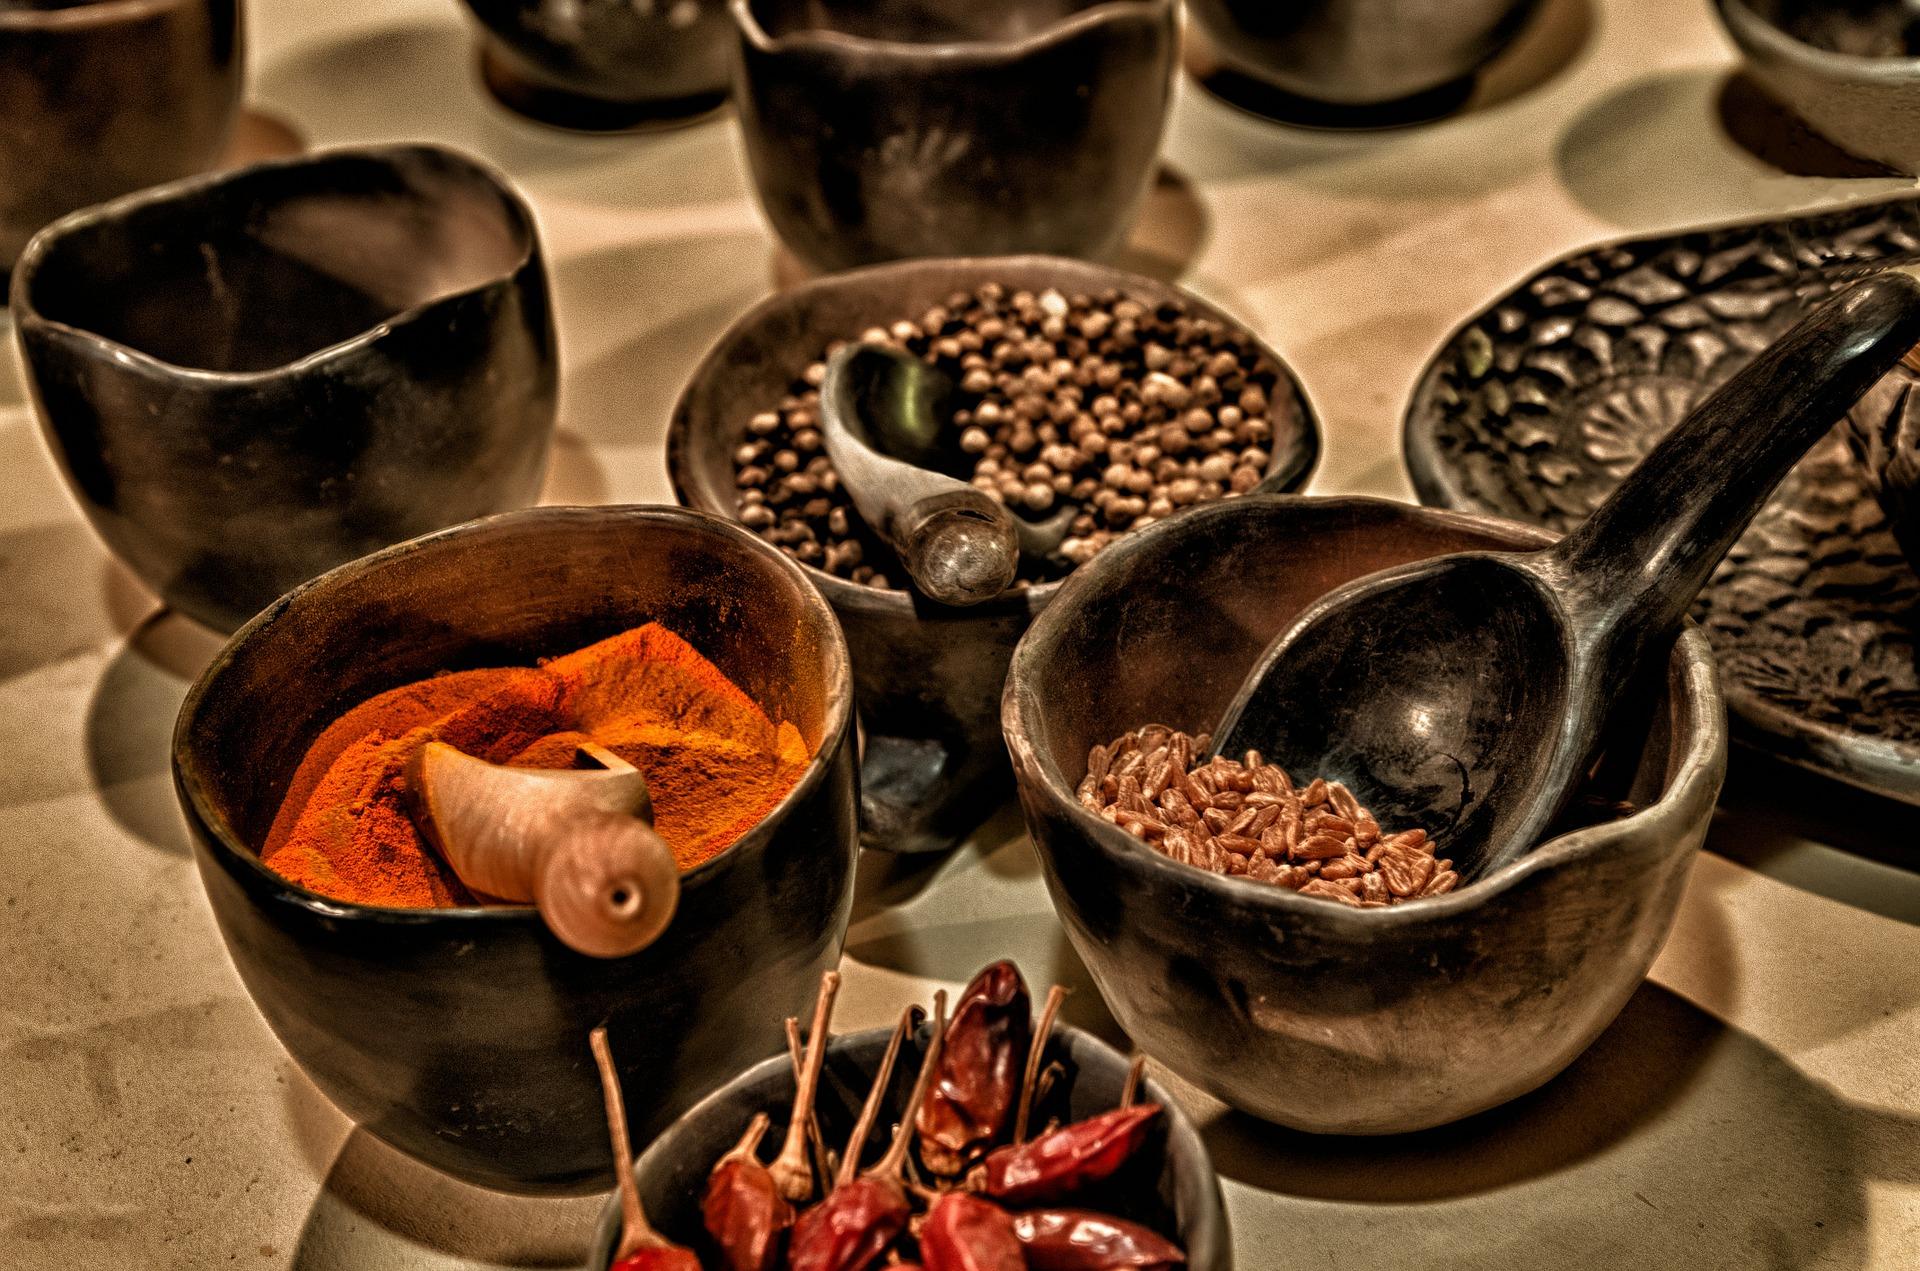 boia ardei iute - sfatulparintilor.ro - pixabay_com